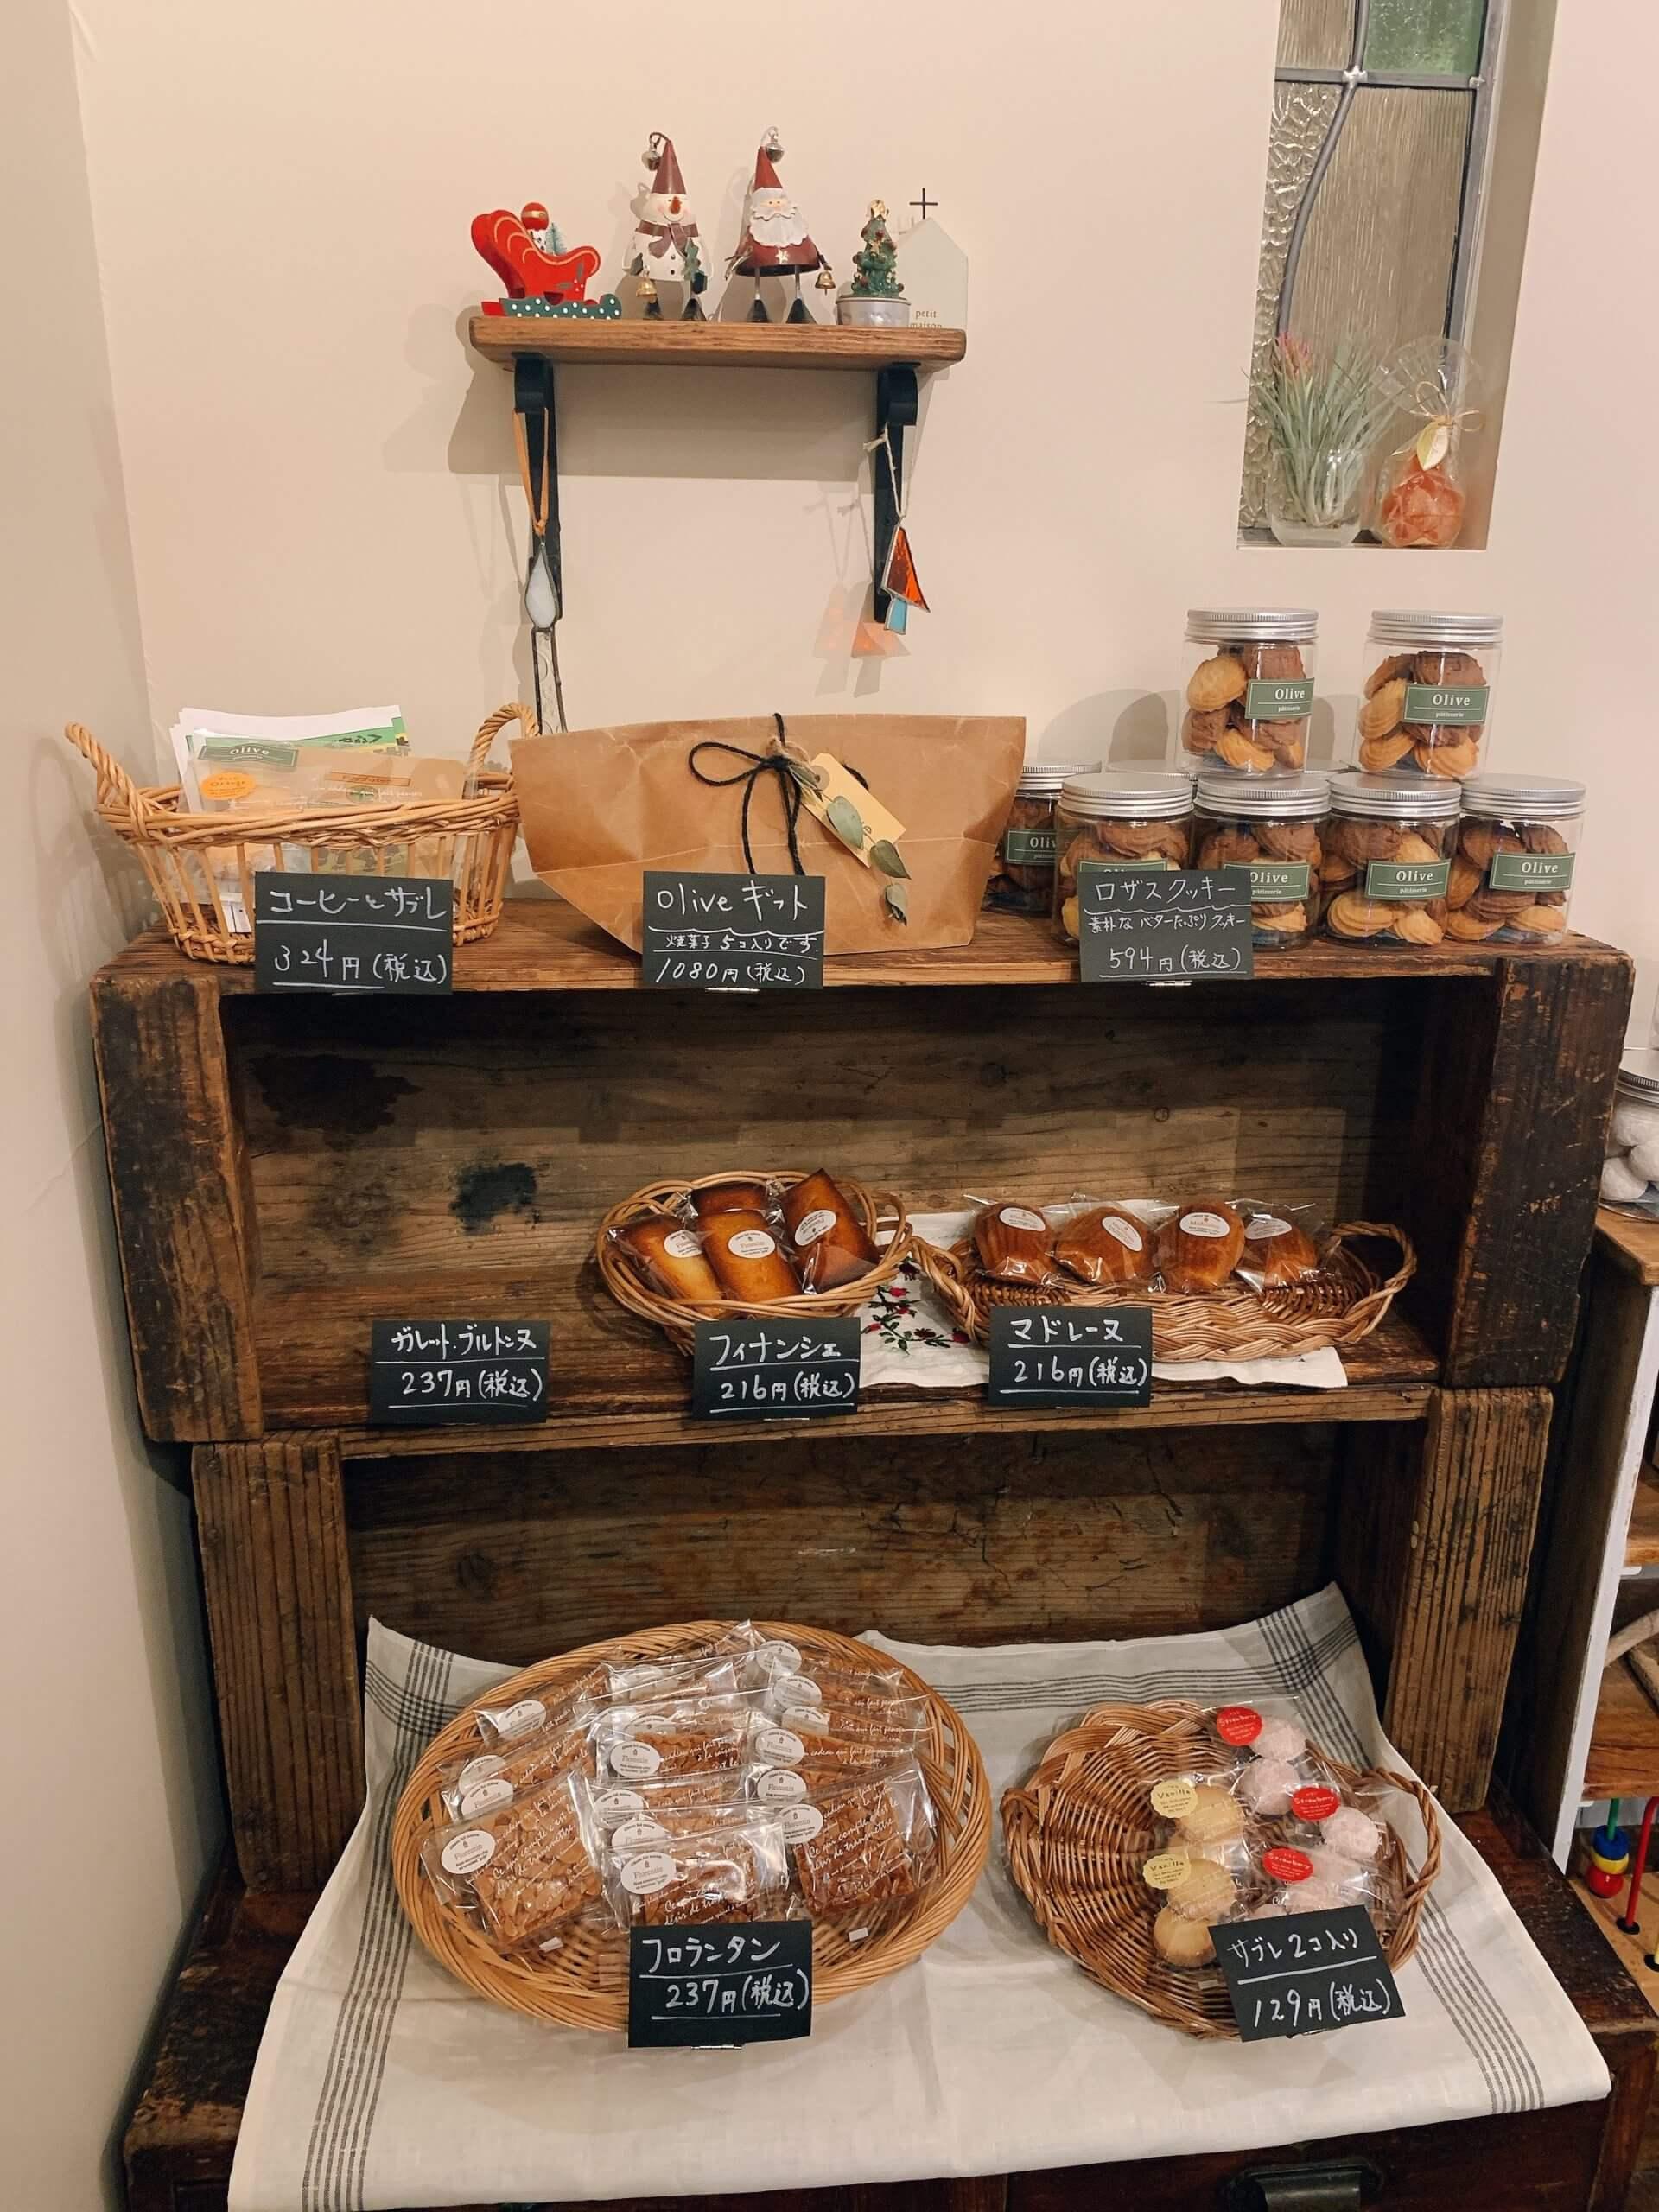 【olive(オリーブ)】住宅街にある、知る人ぞ知る大人気のケーキ屋さん!《熊本市中央区琴平本町》